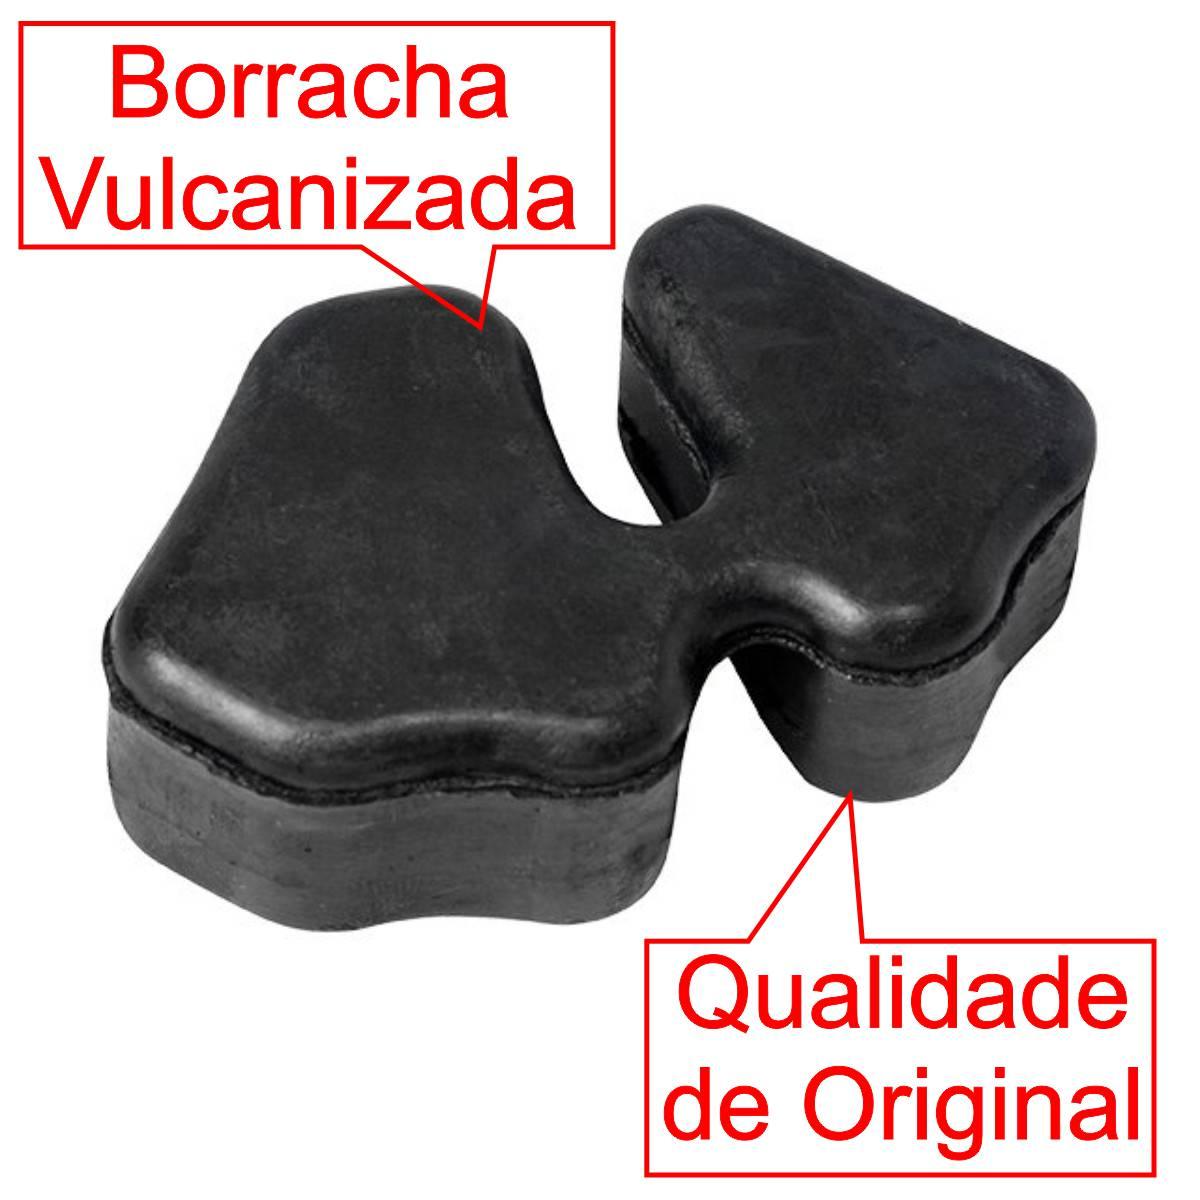 COXIM BRANDY CUBO TRASEIRO BORRACHA RODA MOTO HONDA CBX 250 TWISTER - CB 300R - CB 250F TWISTER